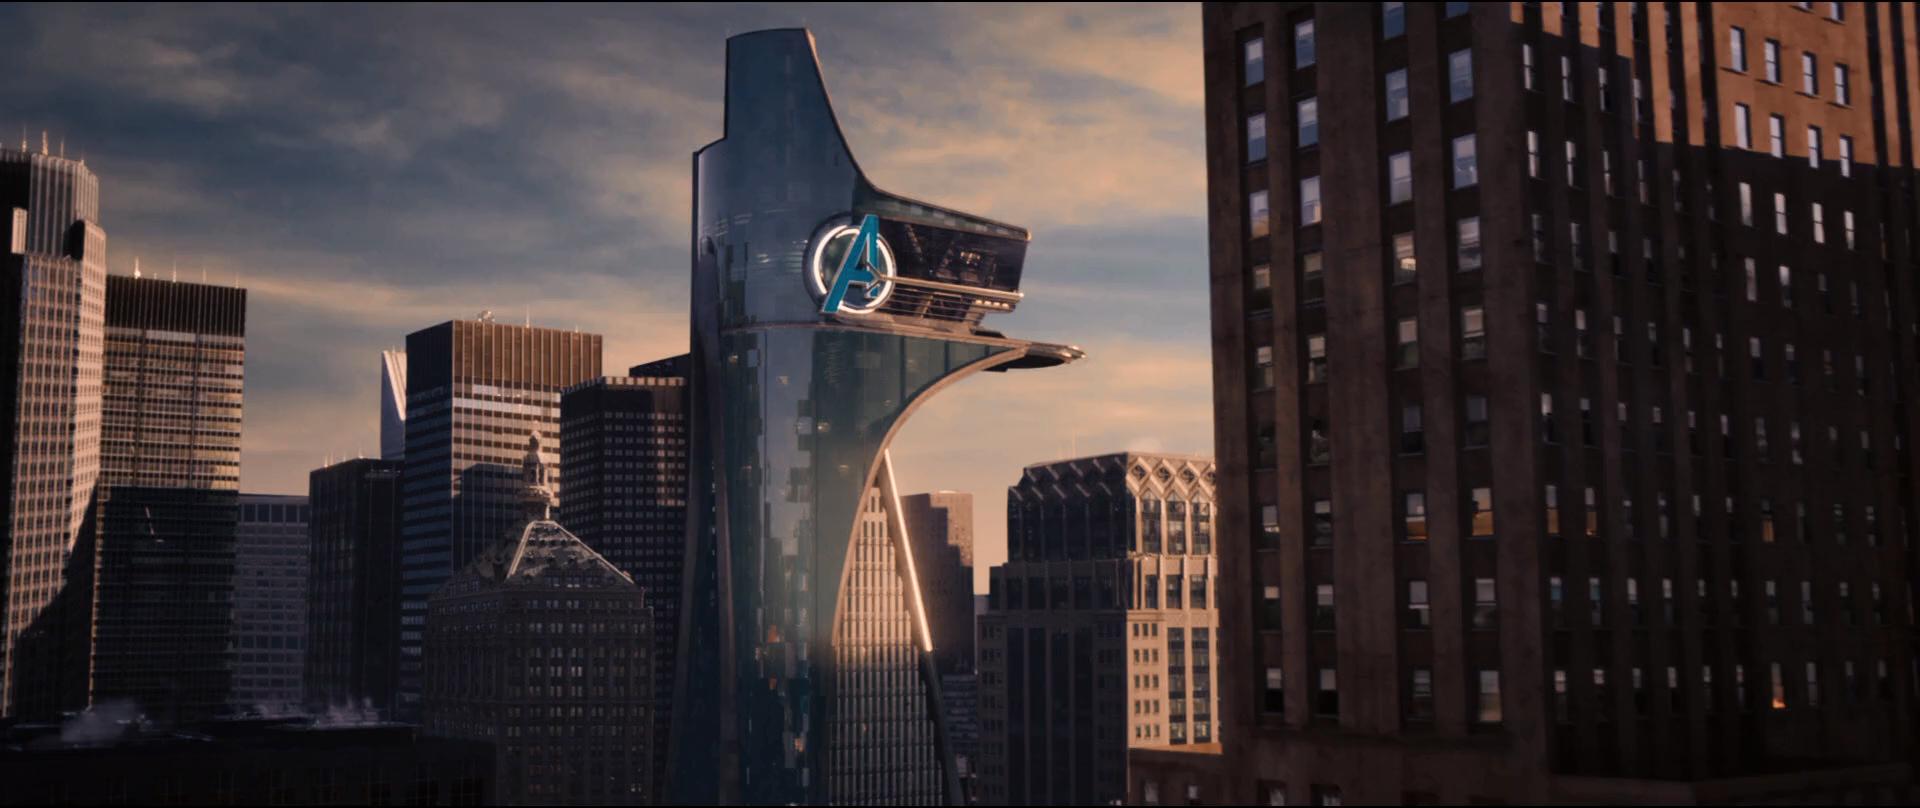 Avengers Tower Marvel Cinematic Universe Wiki Fandom